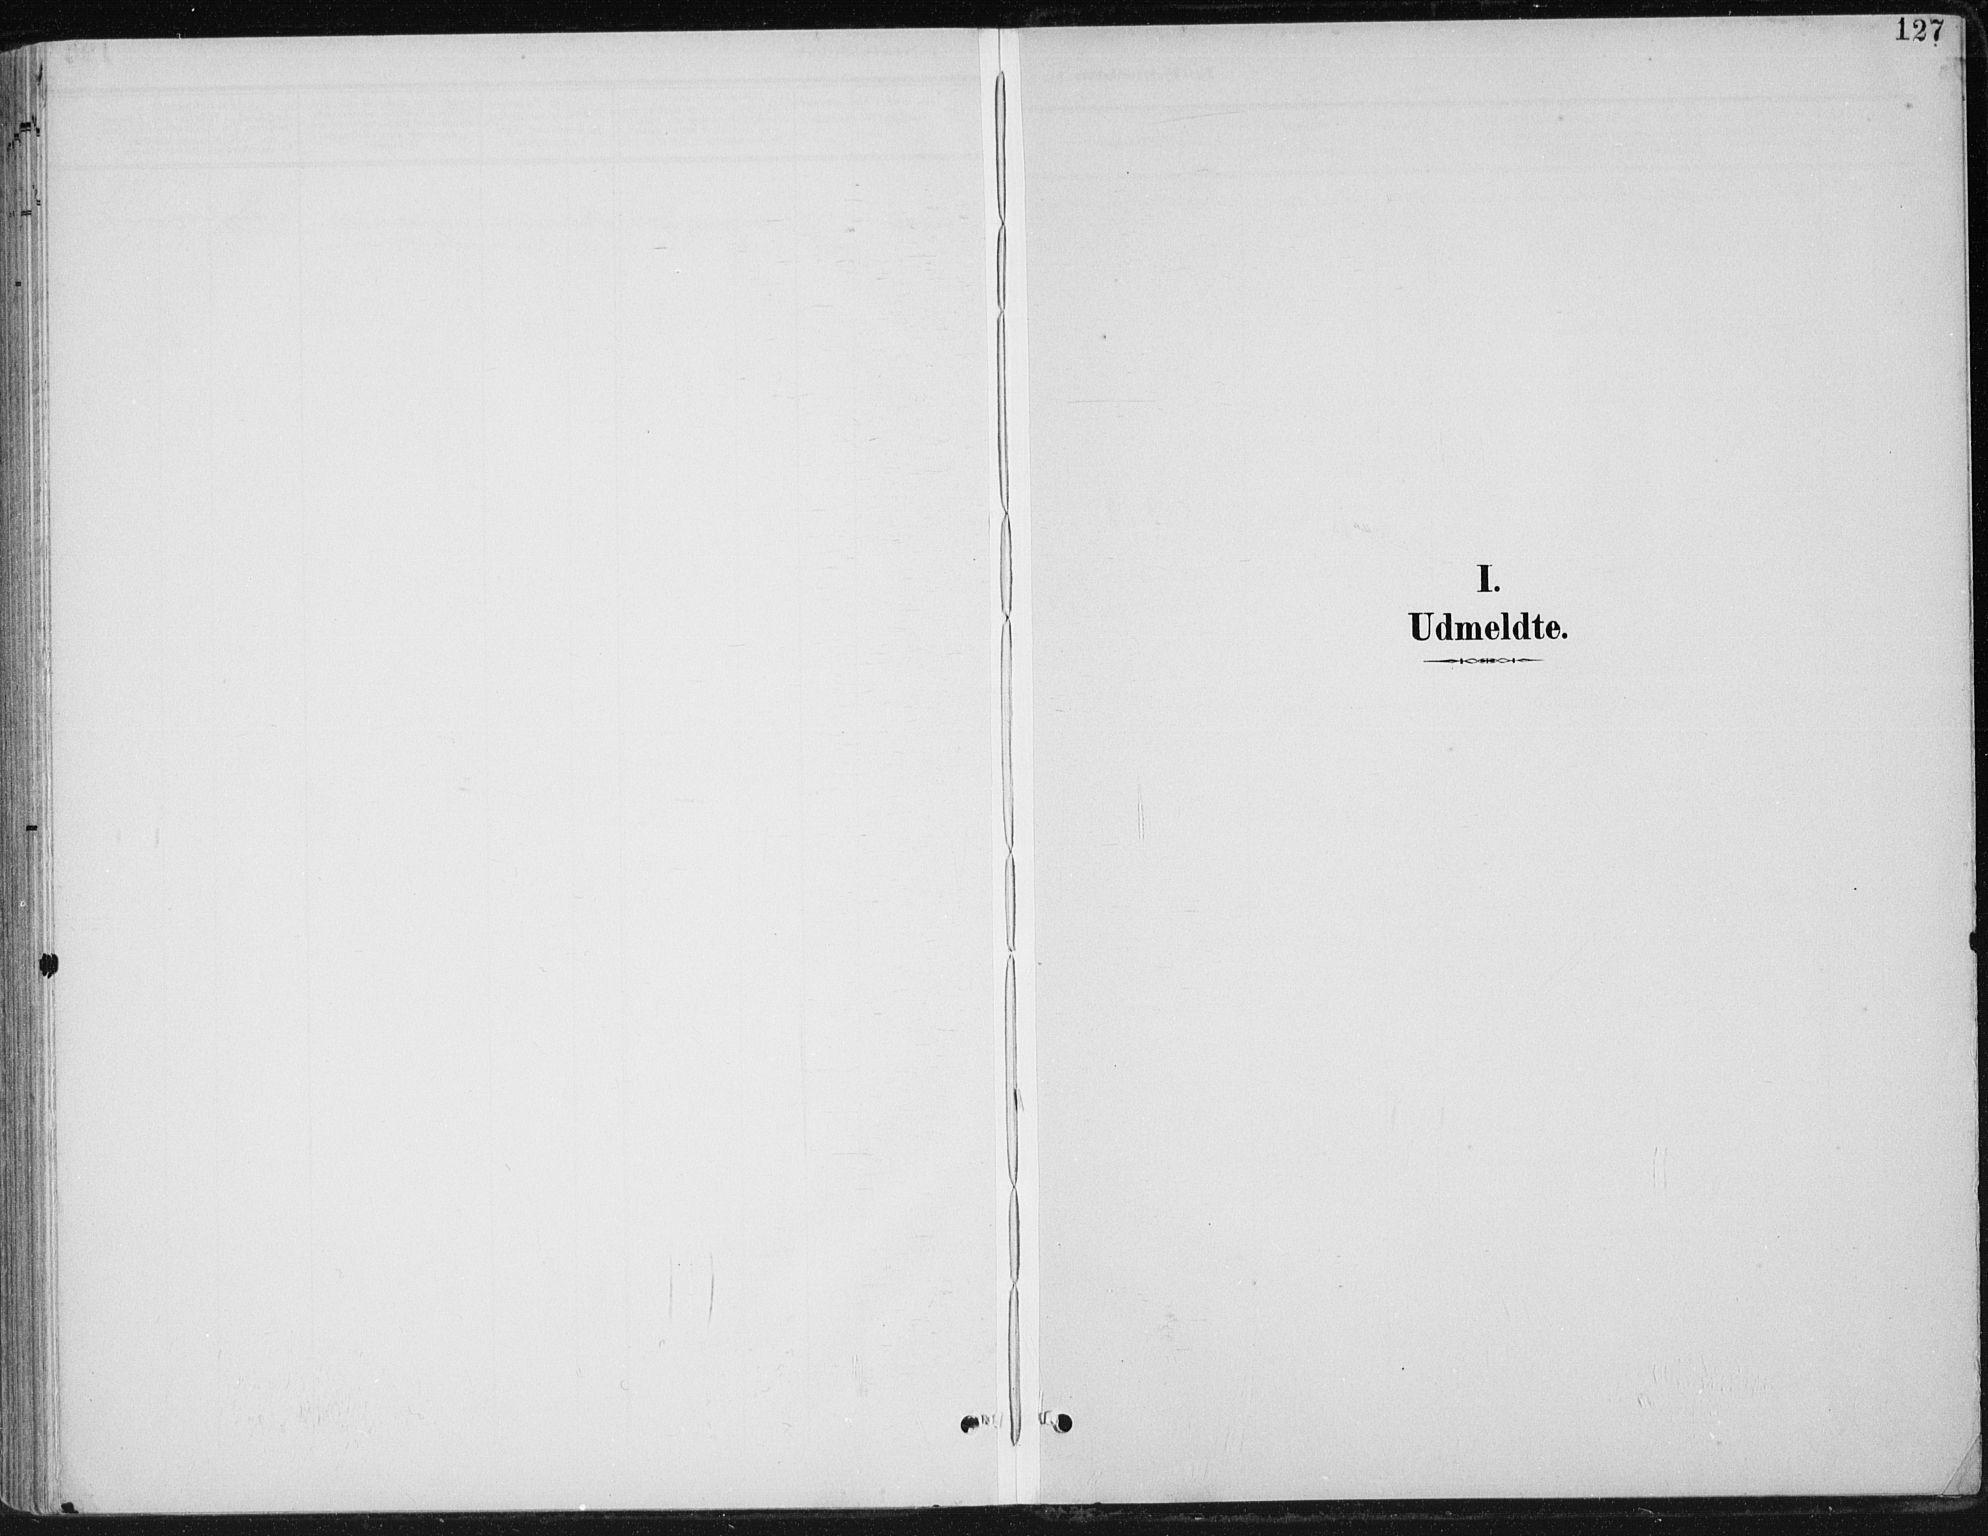 SAH, Østre Gausdal prestekontor, Ministerialbok nr. 5, 1902-1920, s. 127